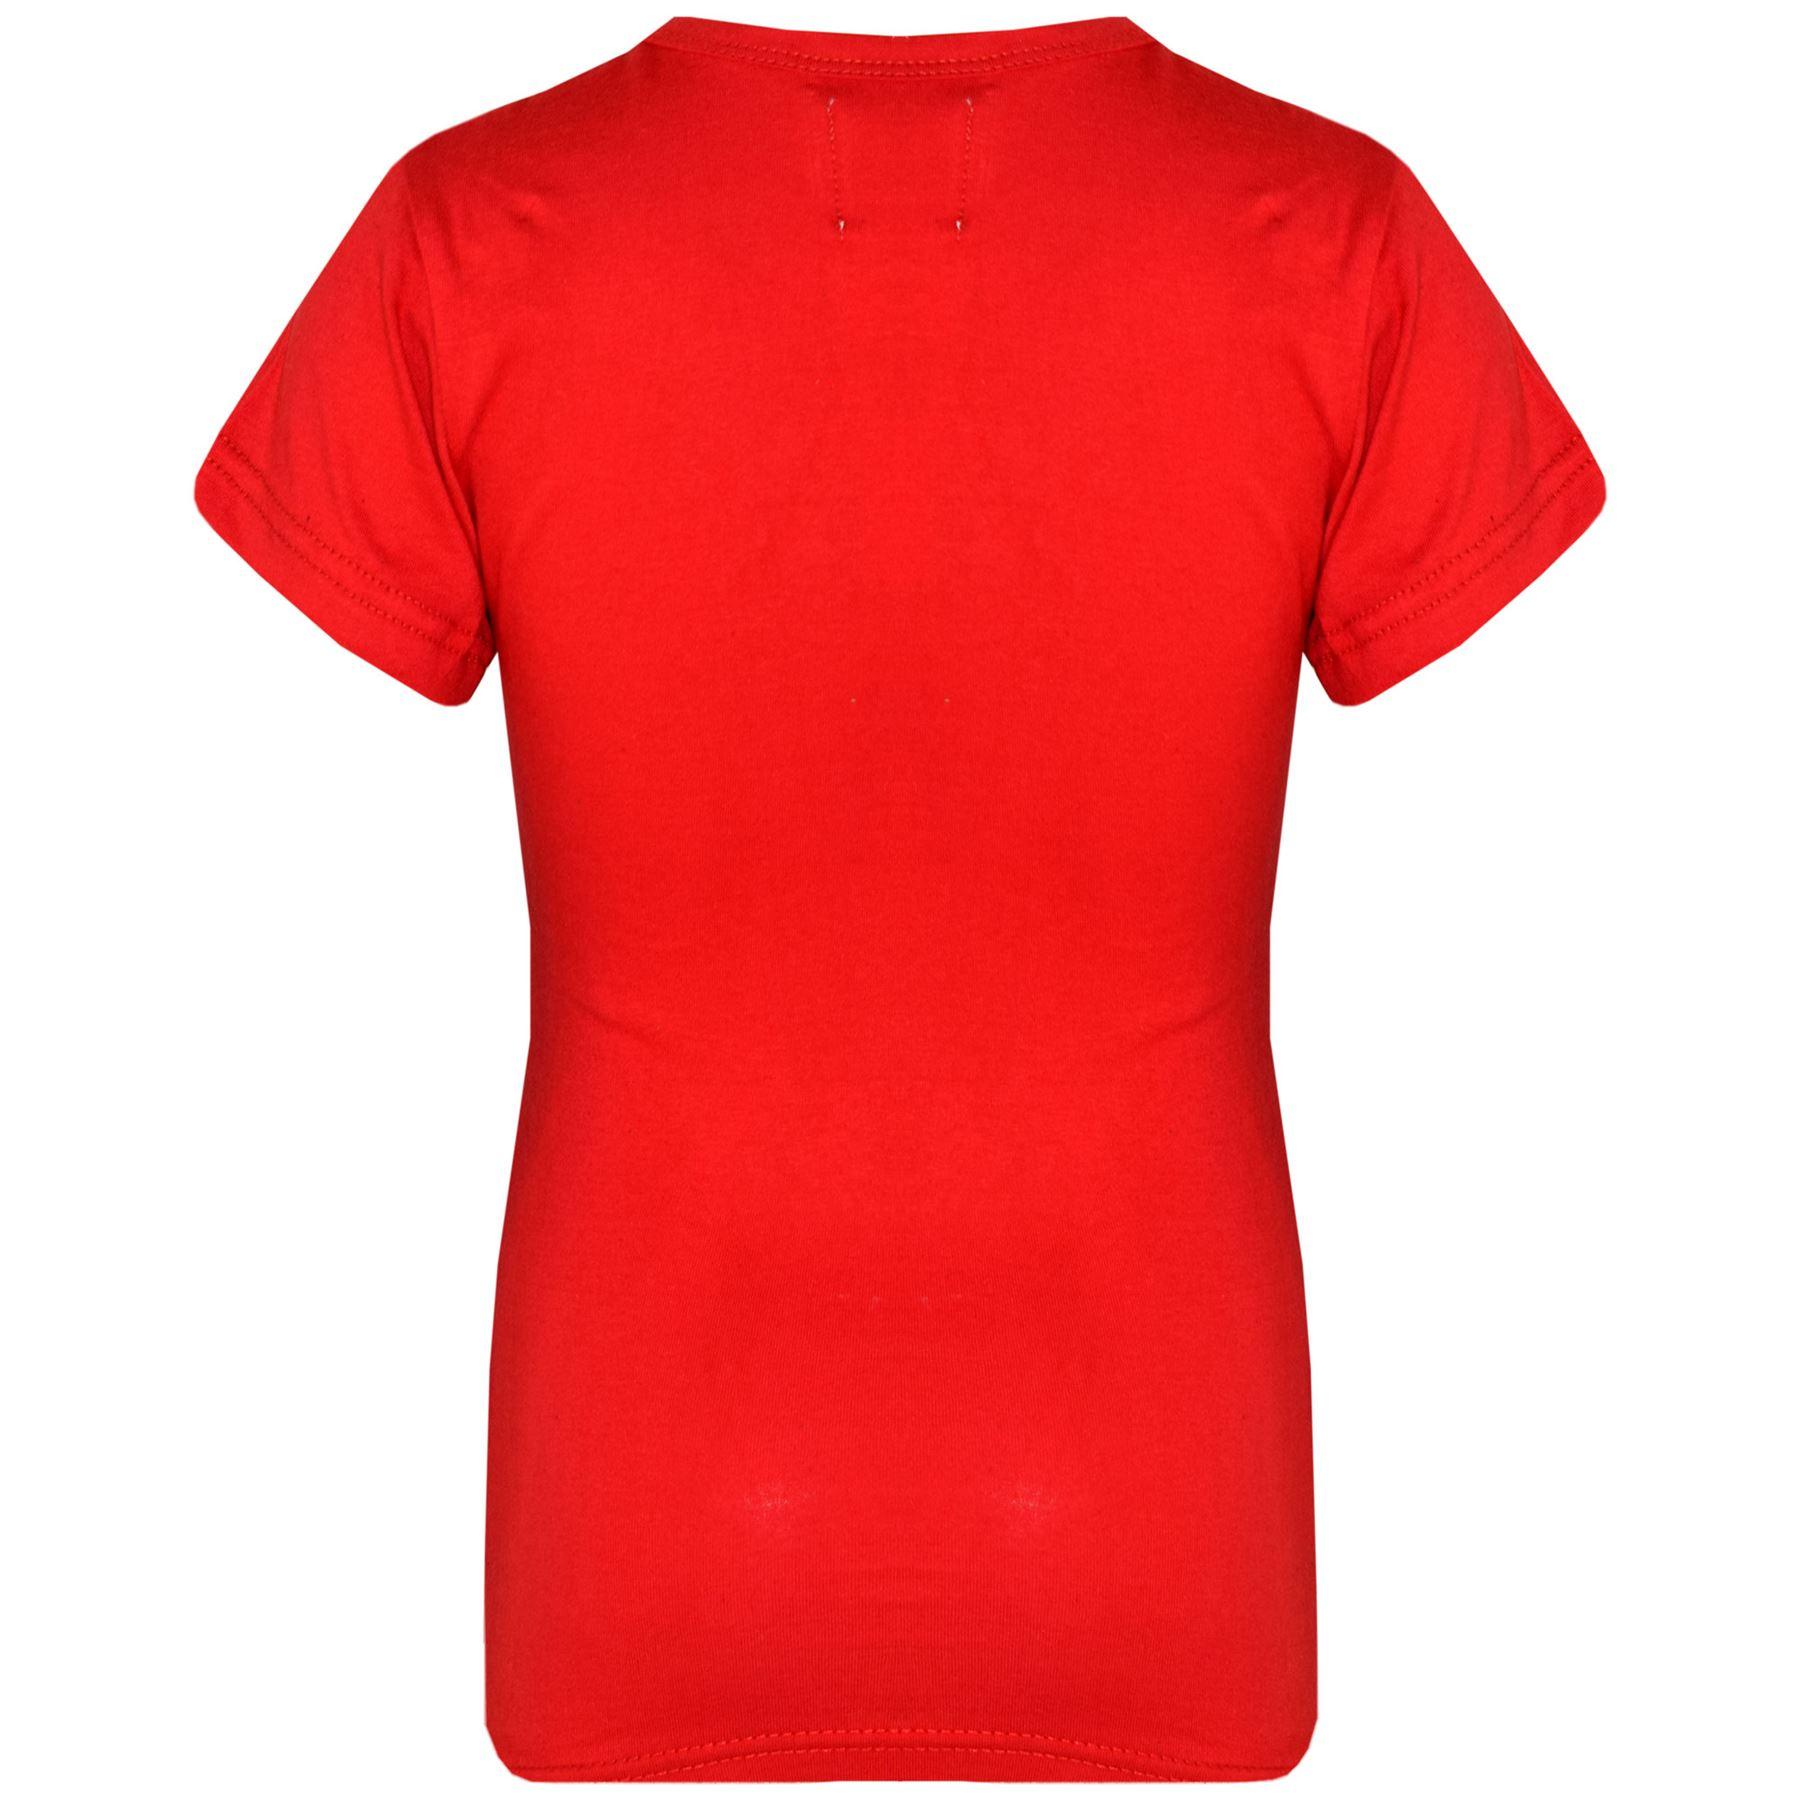 Kids-Girls-T-Shirts-Designer-100-Cotton-Plain-School-T-Shirt-Top-New-Age-3-13Yr thumbnail 33